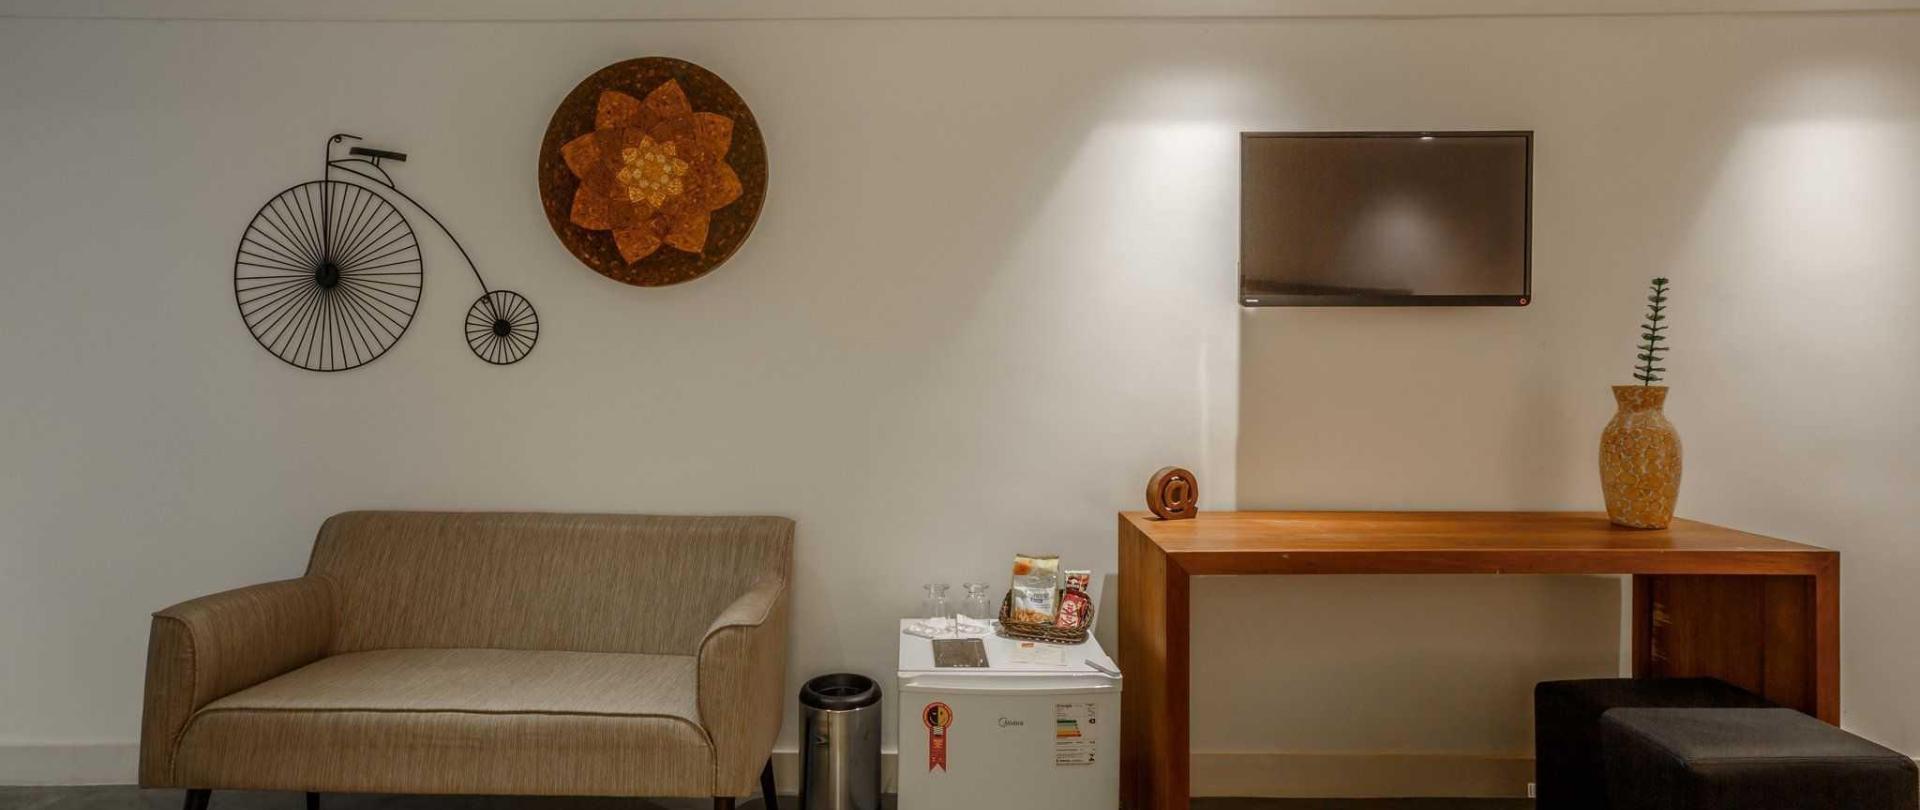 20160304_da_lapa_design_hotel_-_wlp_0095_-_tratada.jpg